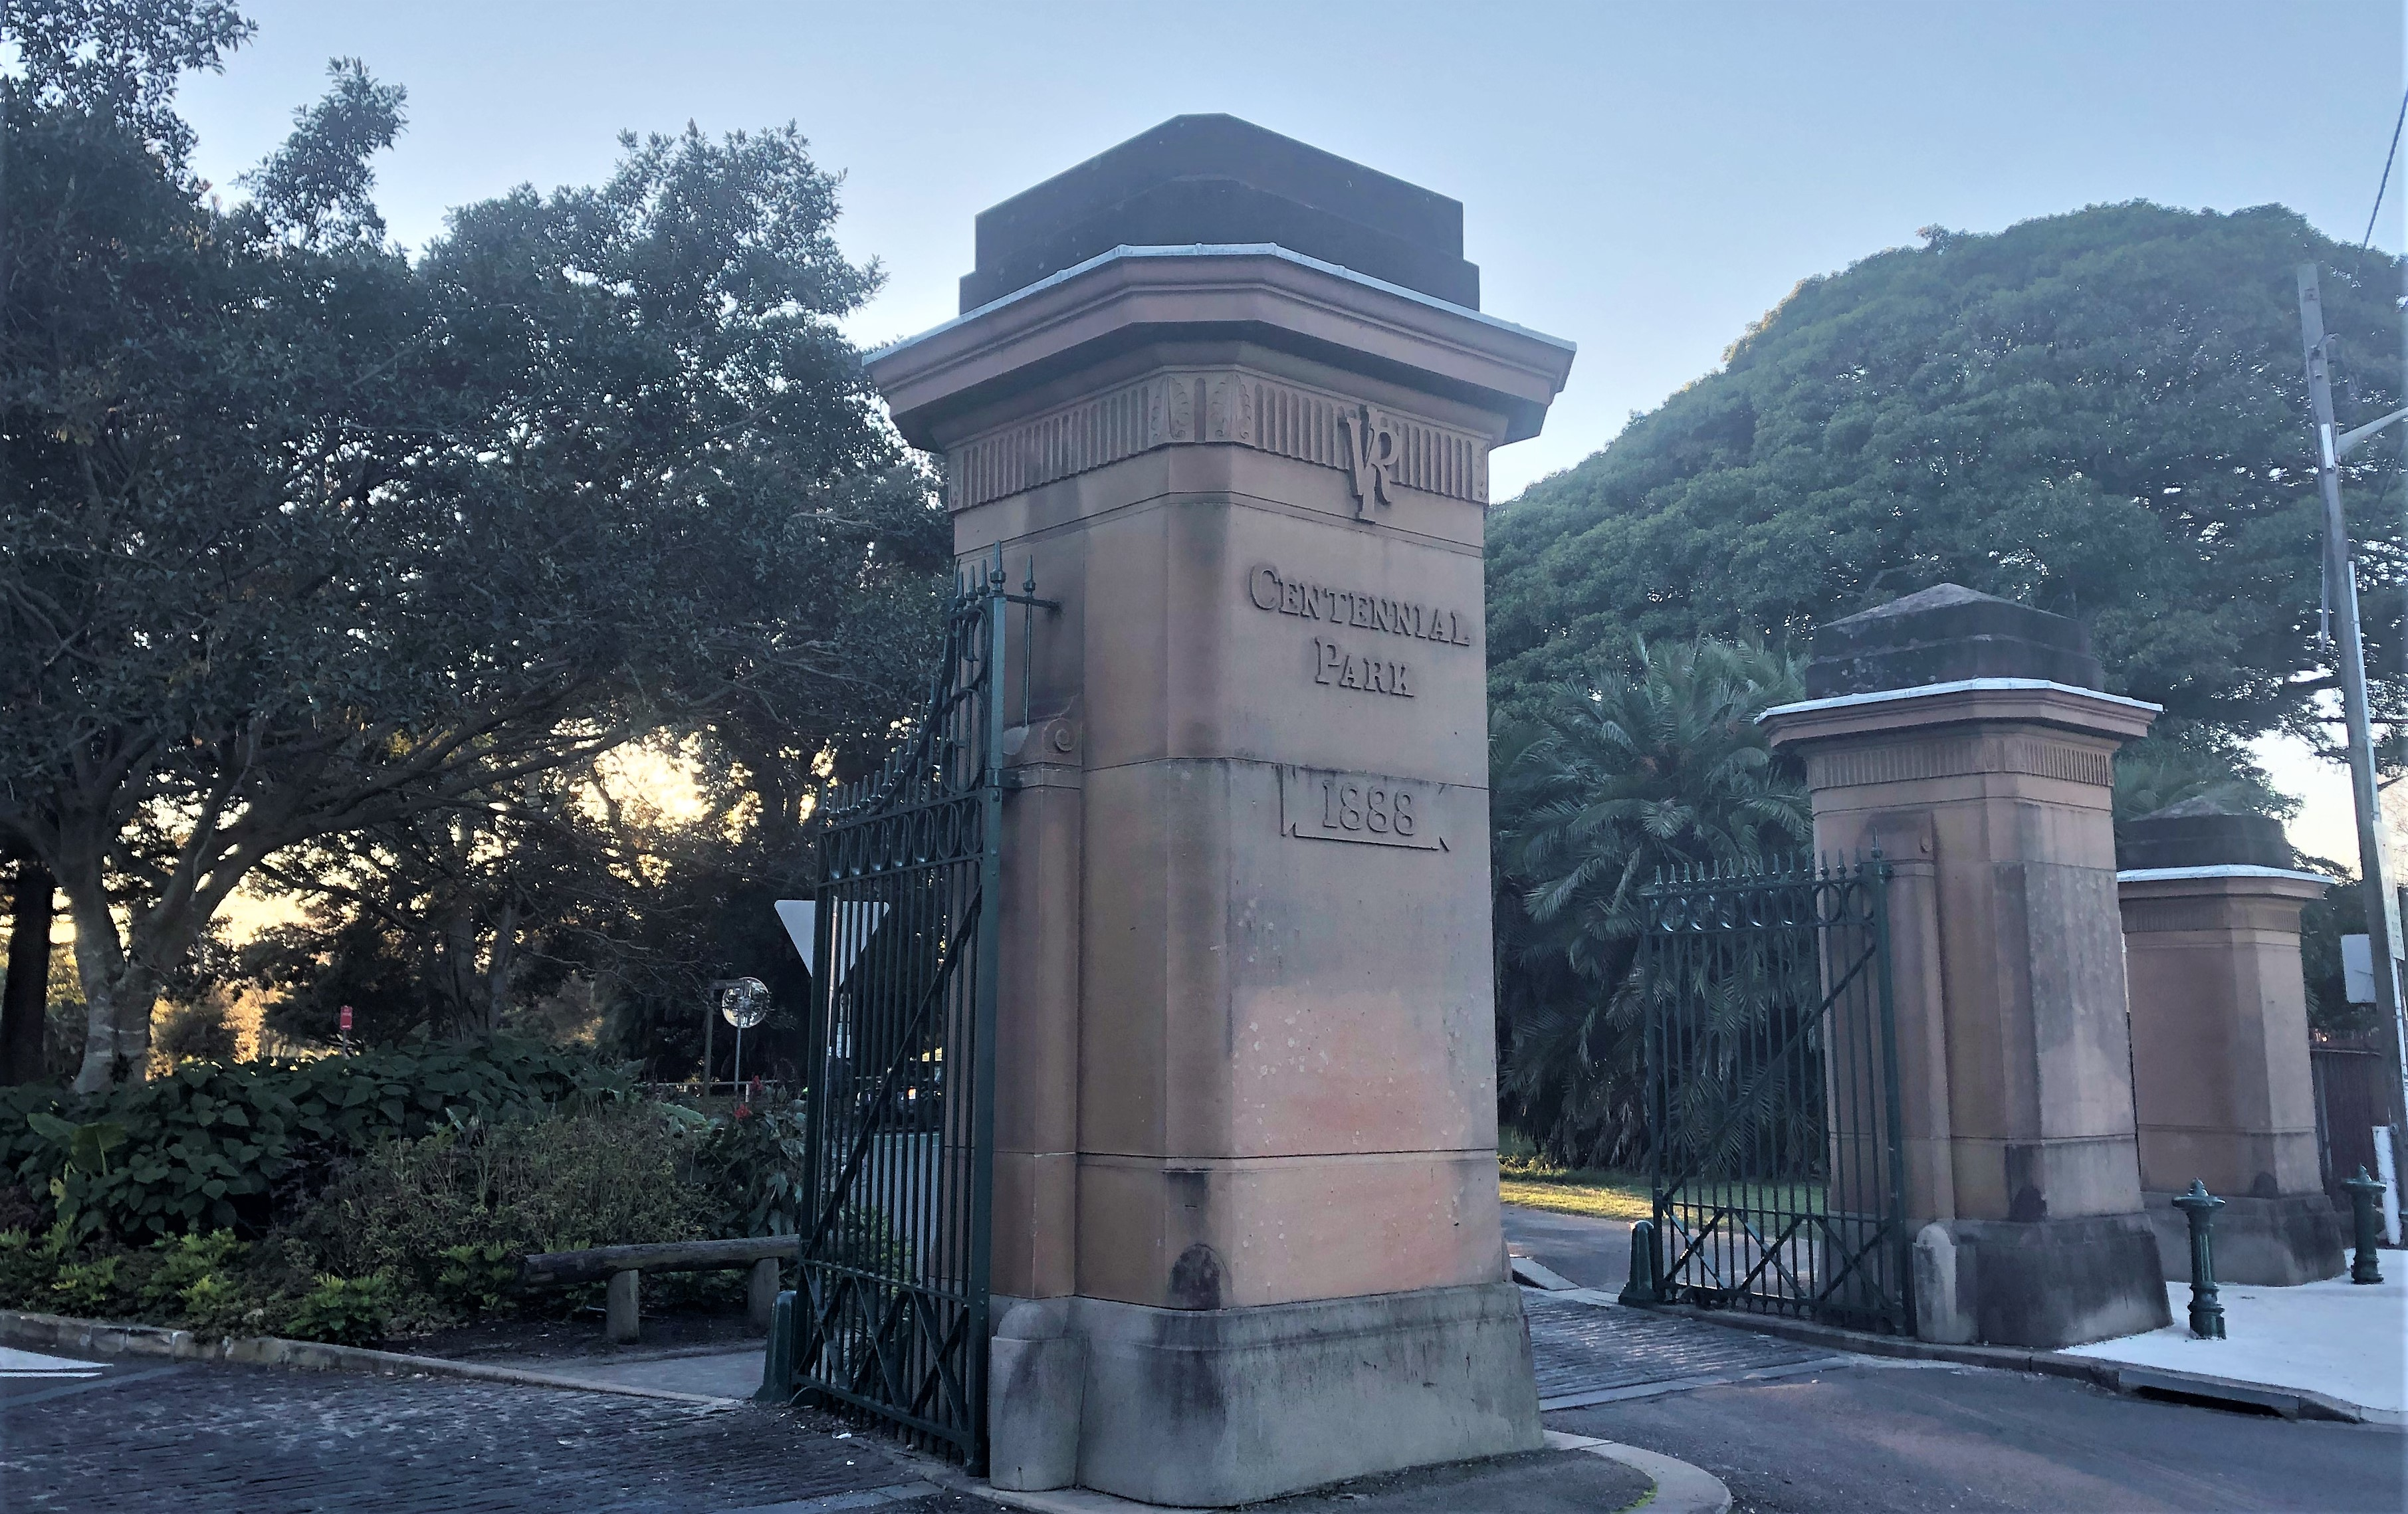 Gates to Centennial Park